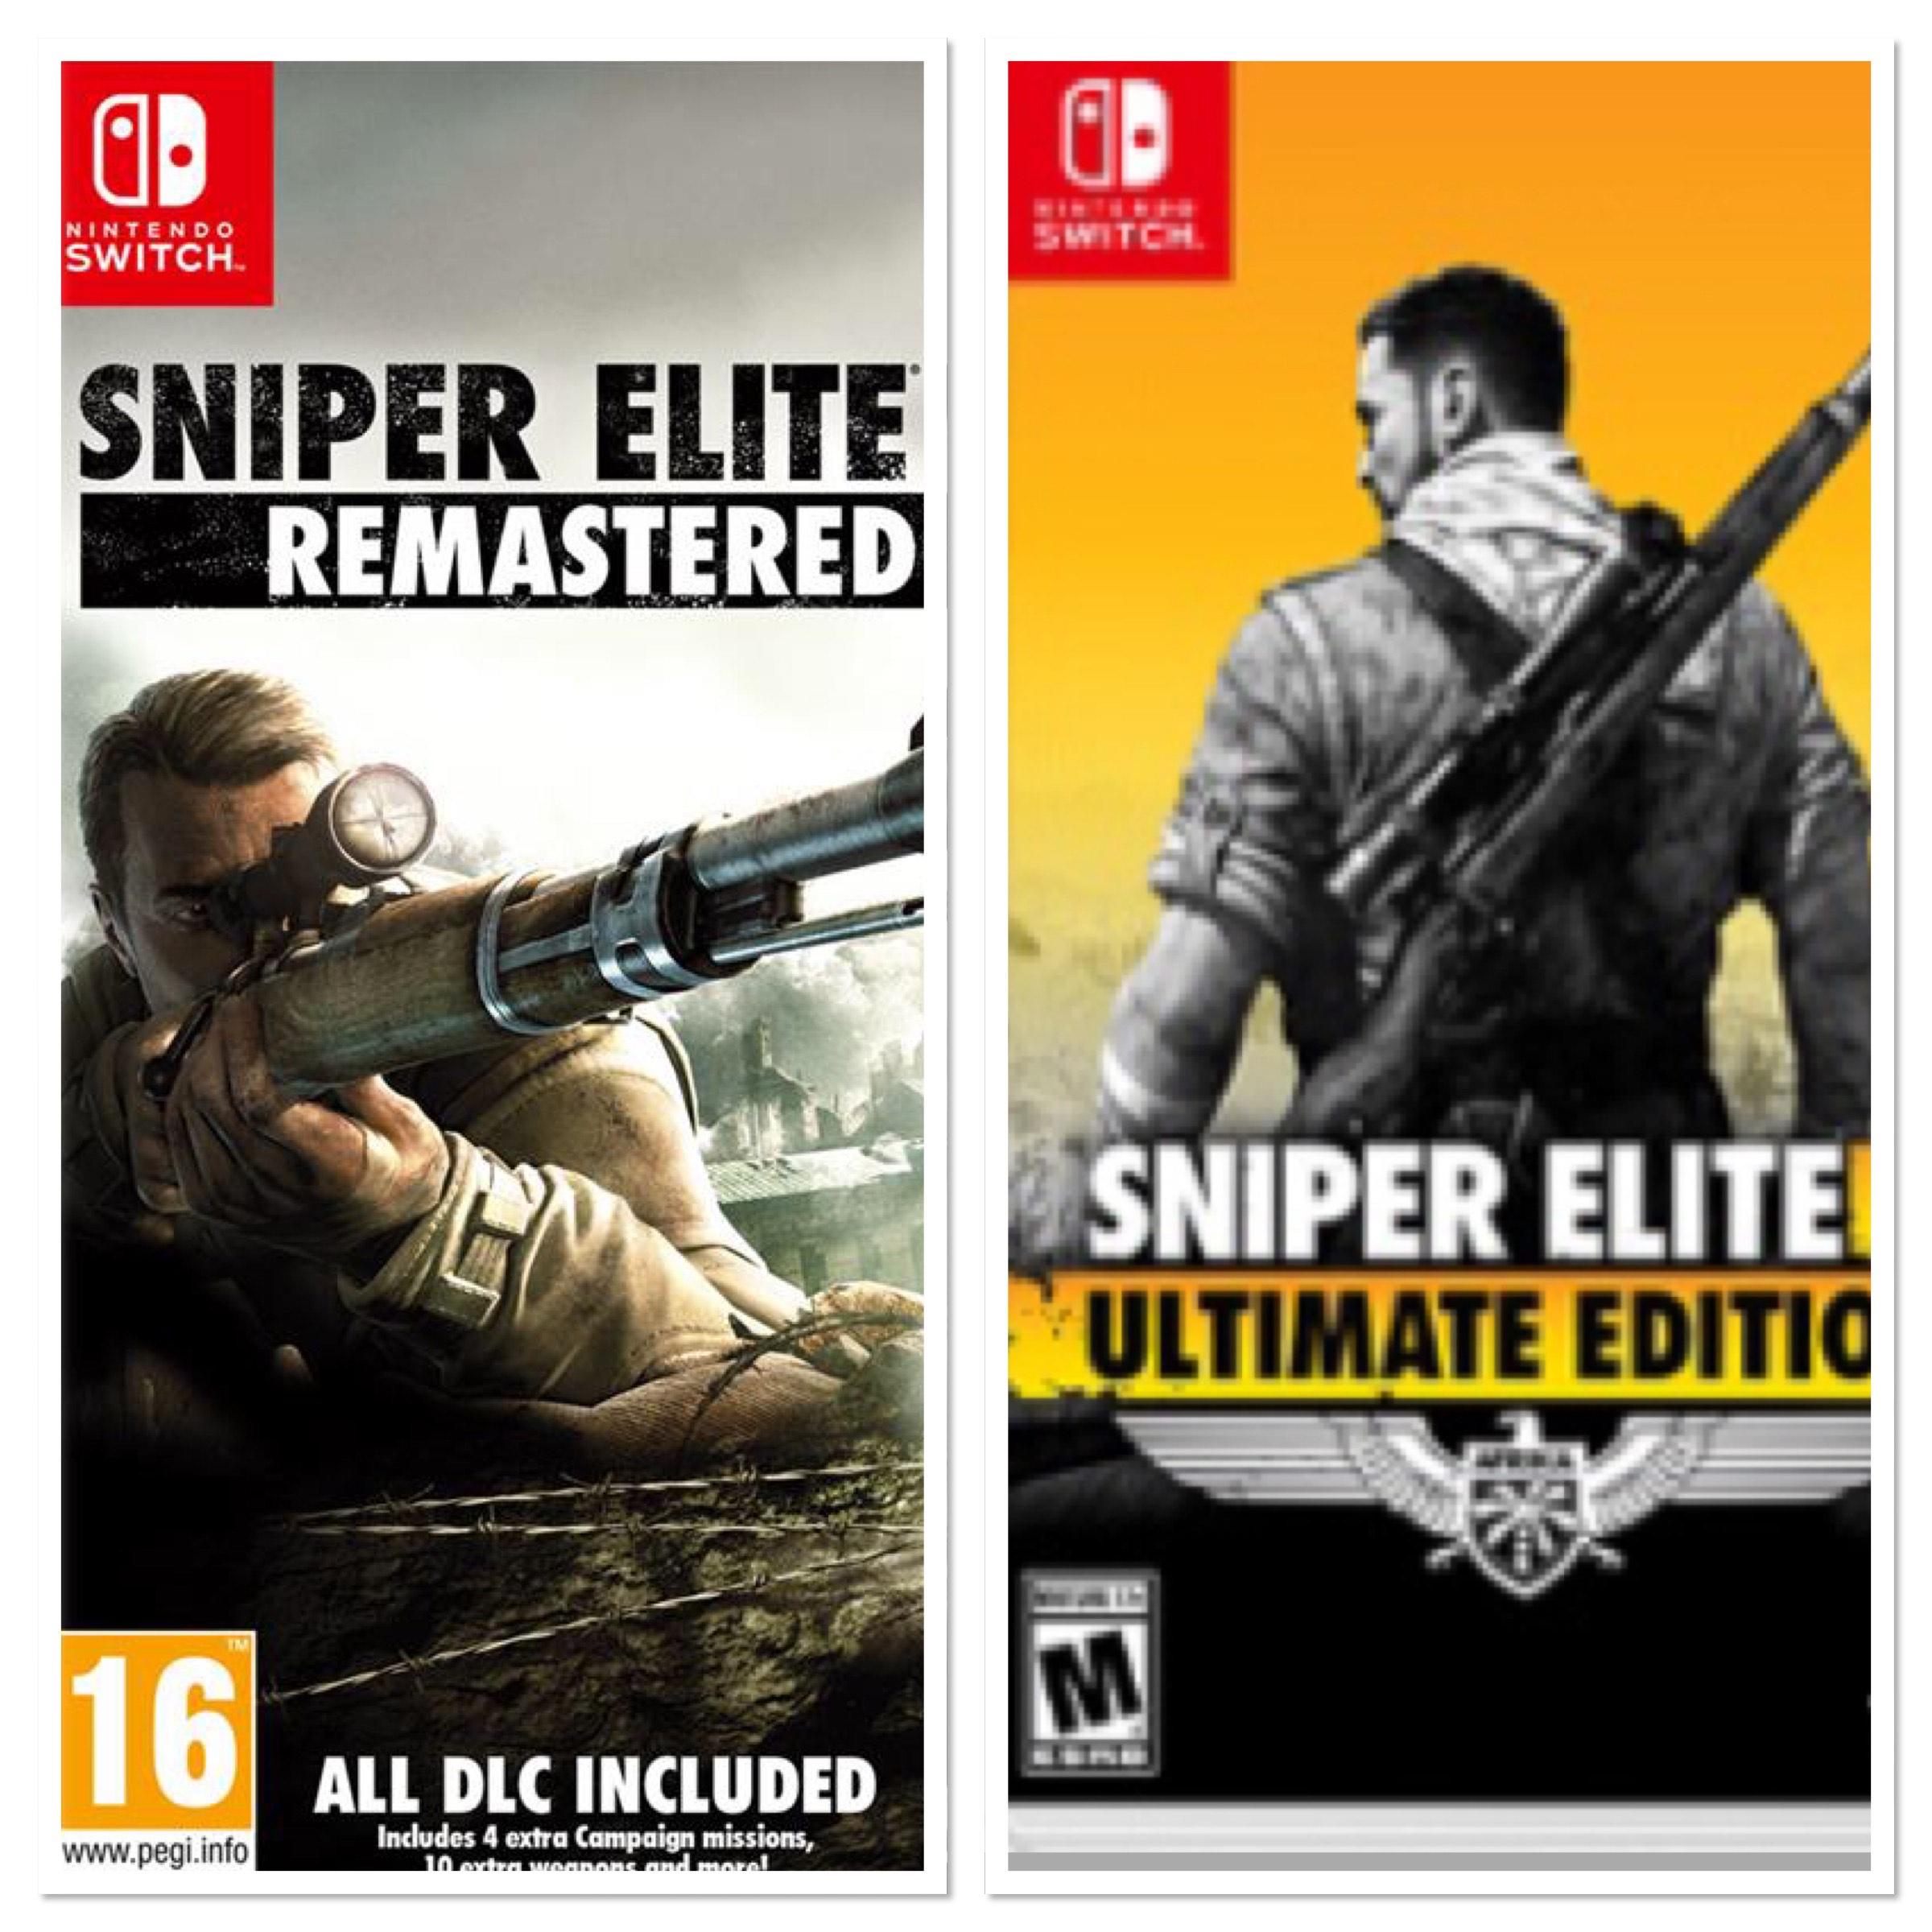 Nintendo Switch - Sniper elite 2 en 3 remastered